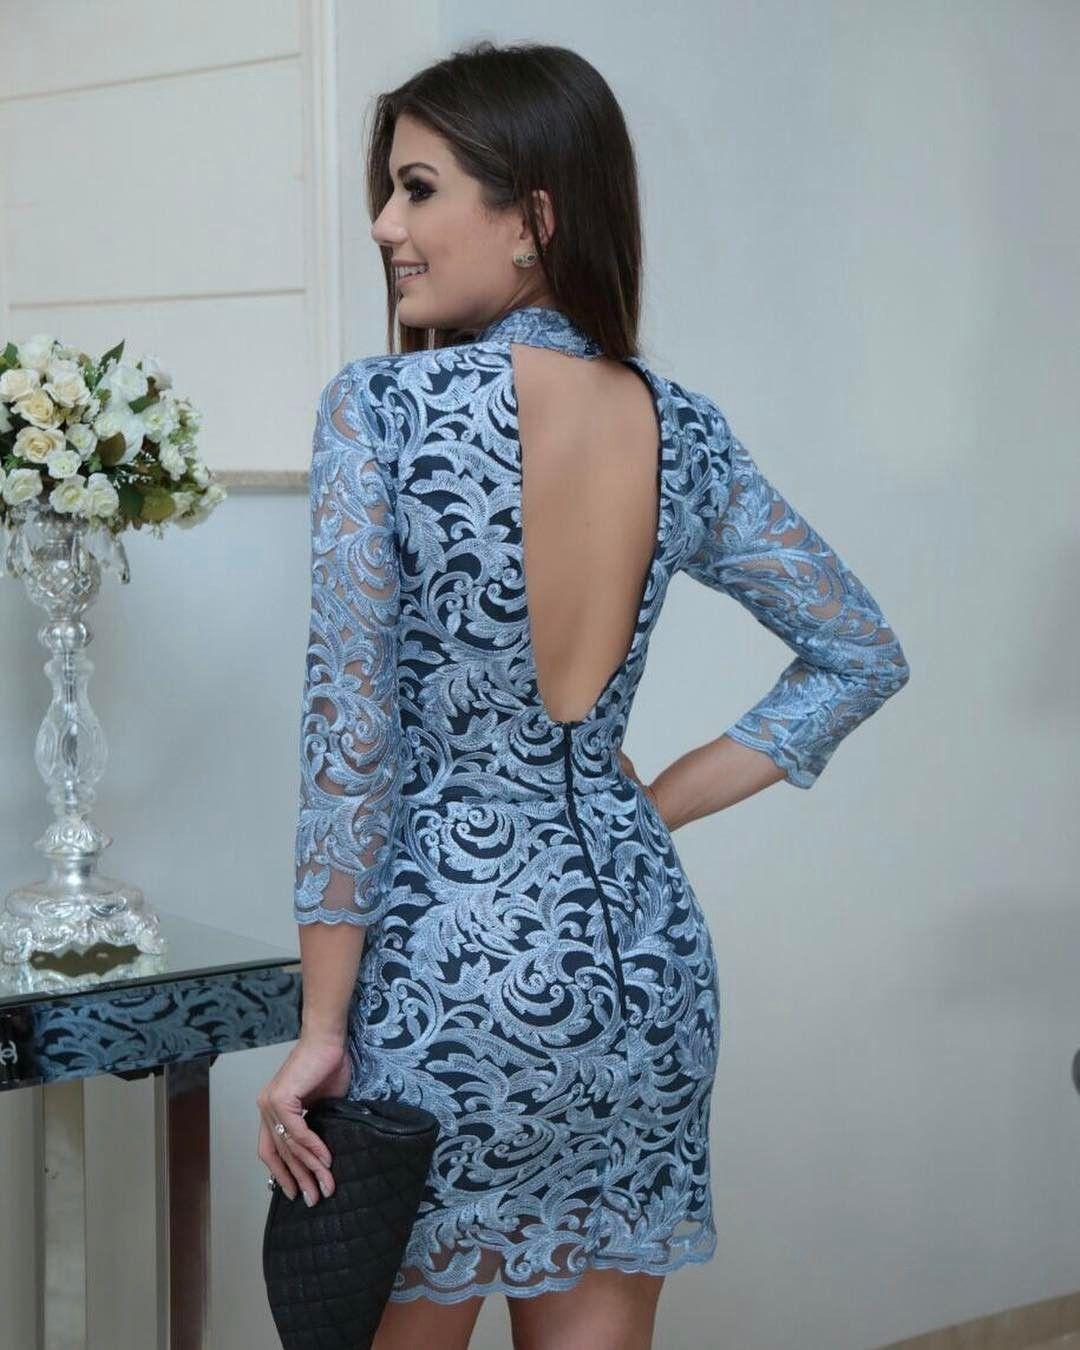 67941ef91e36 Detalhes #moda #atacado #desnude | vestidos | Vestidos, Vestido de ...